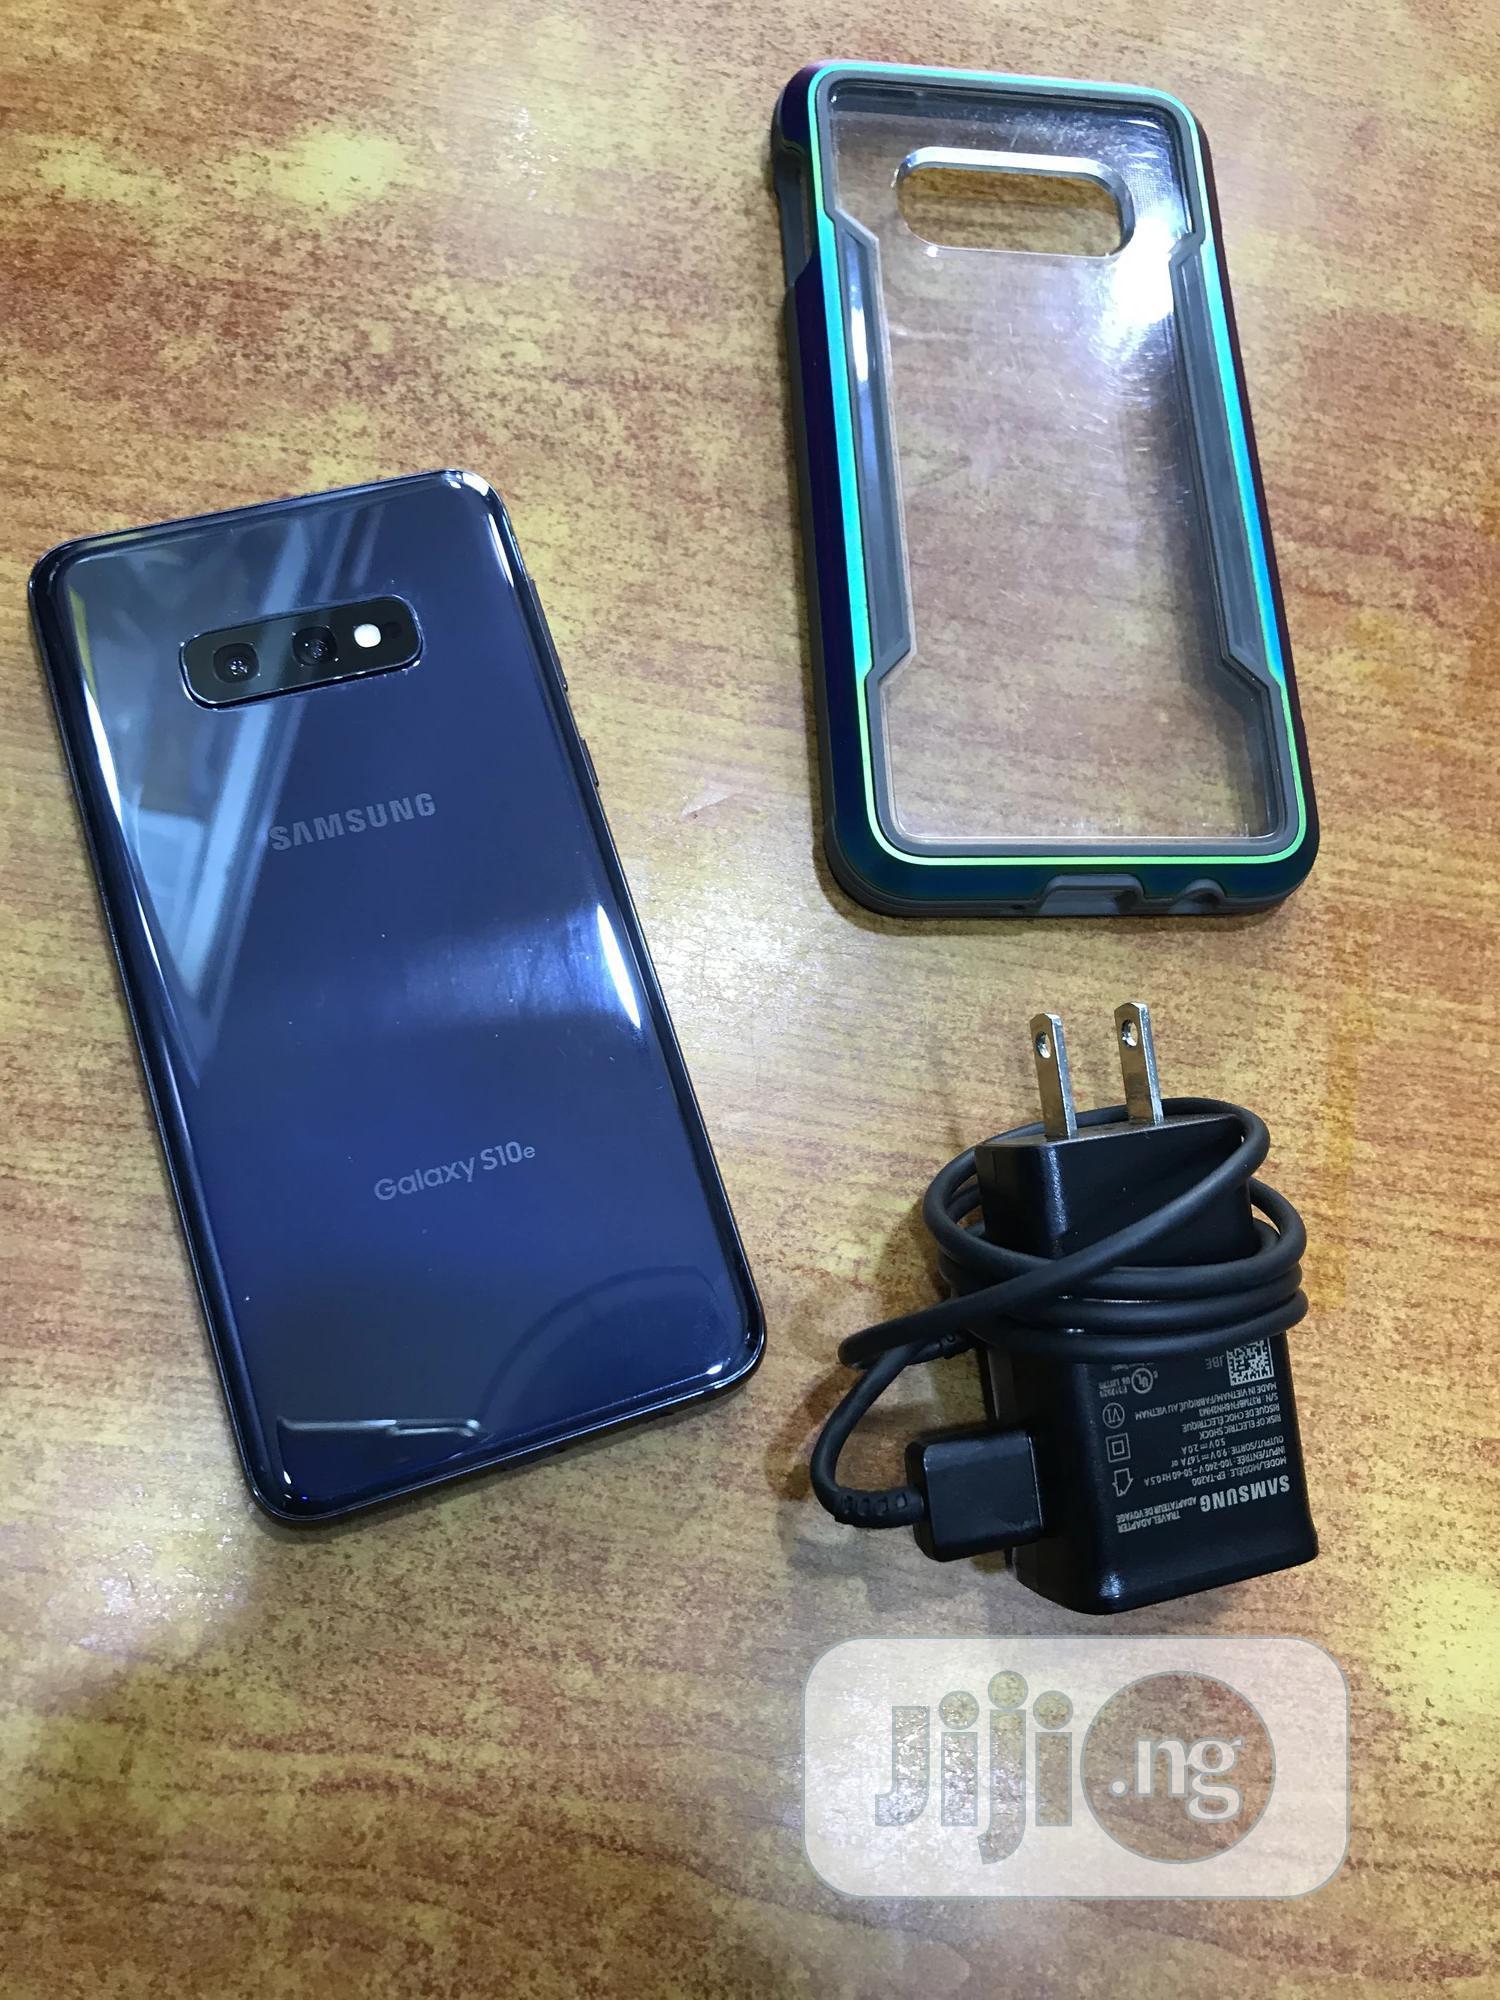 Samsung Galaxy S10e 128 GB Black | Mobile Phones for sale in Ikeja, Lagos State, Nigeria